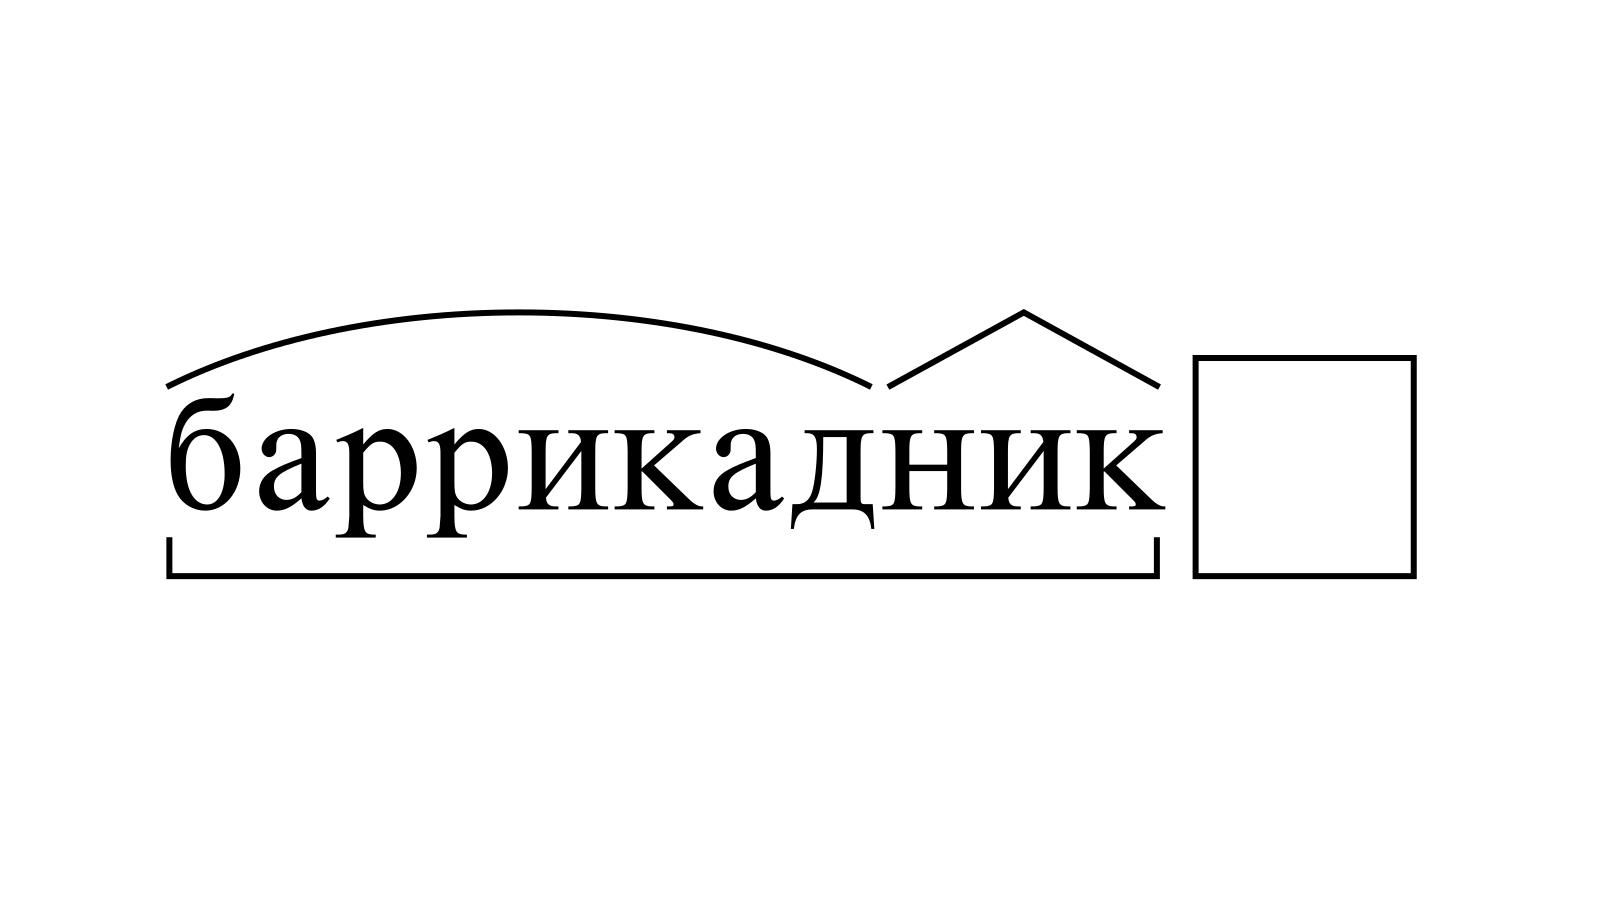 Разбор слова «баррикадник» по составу